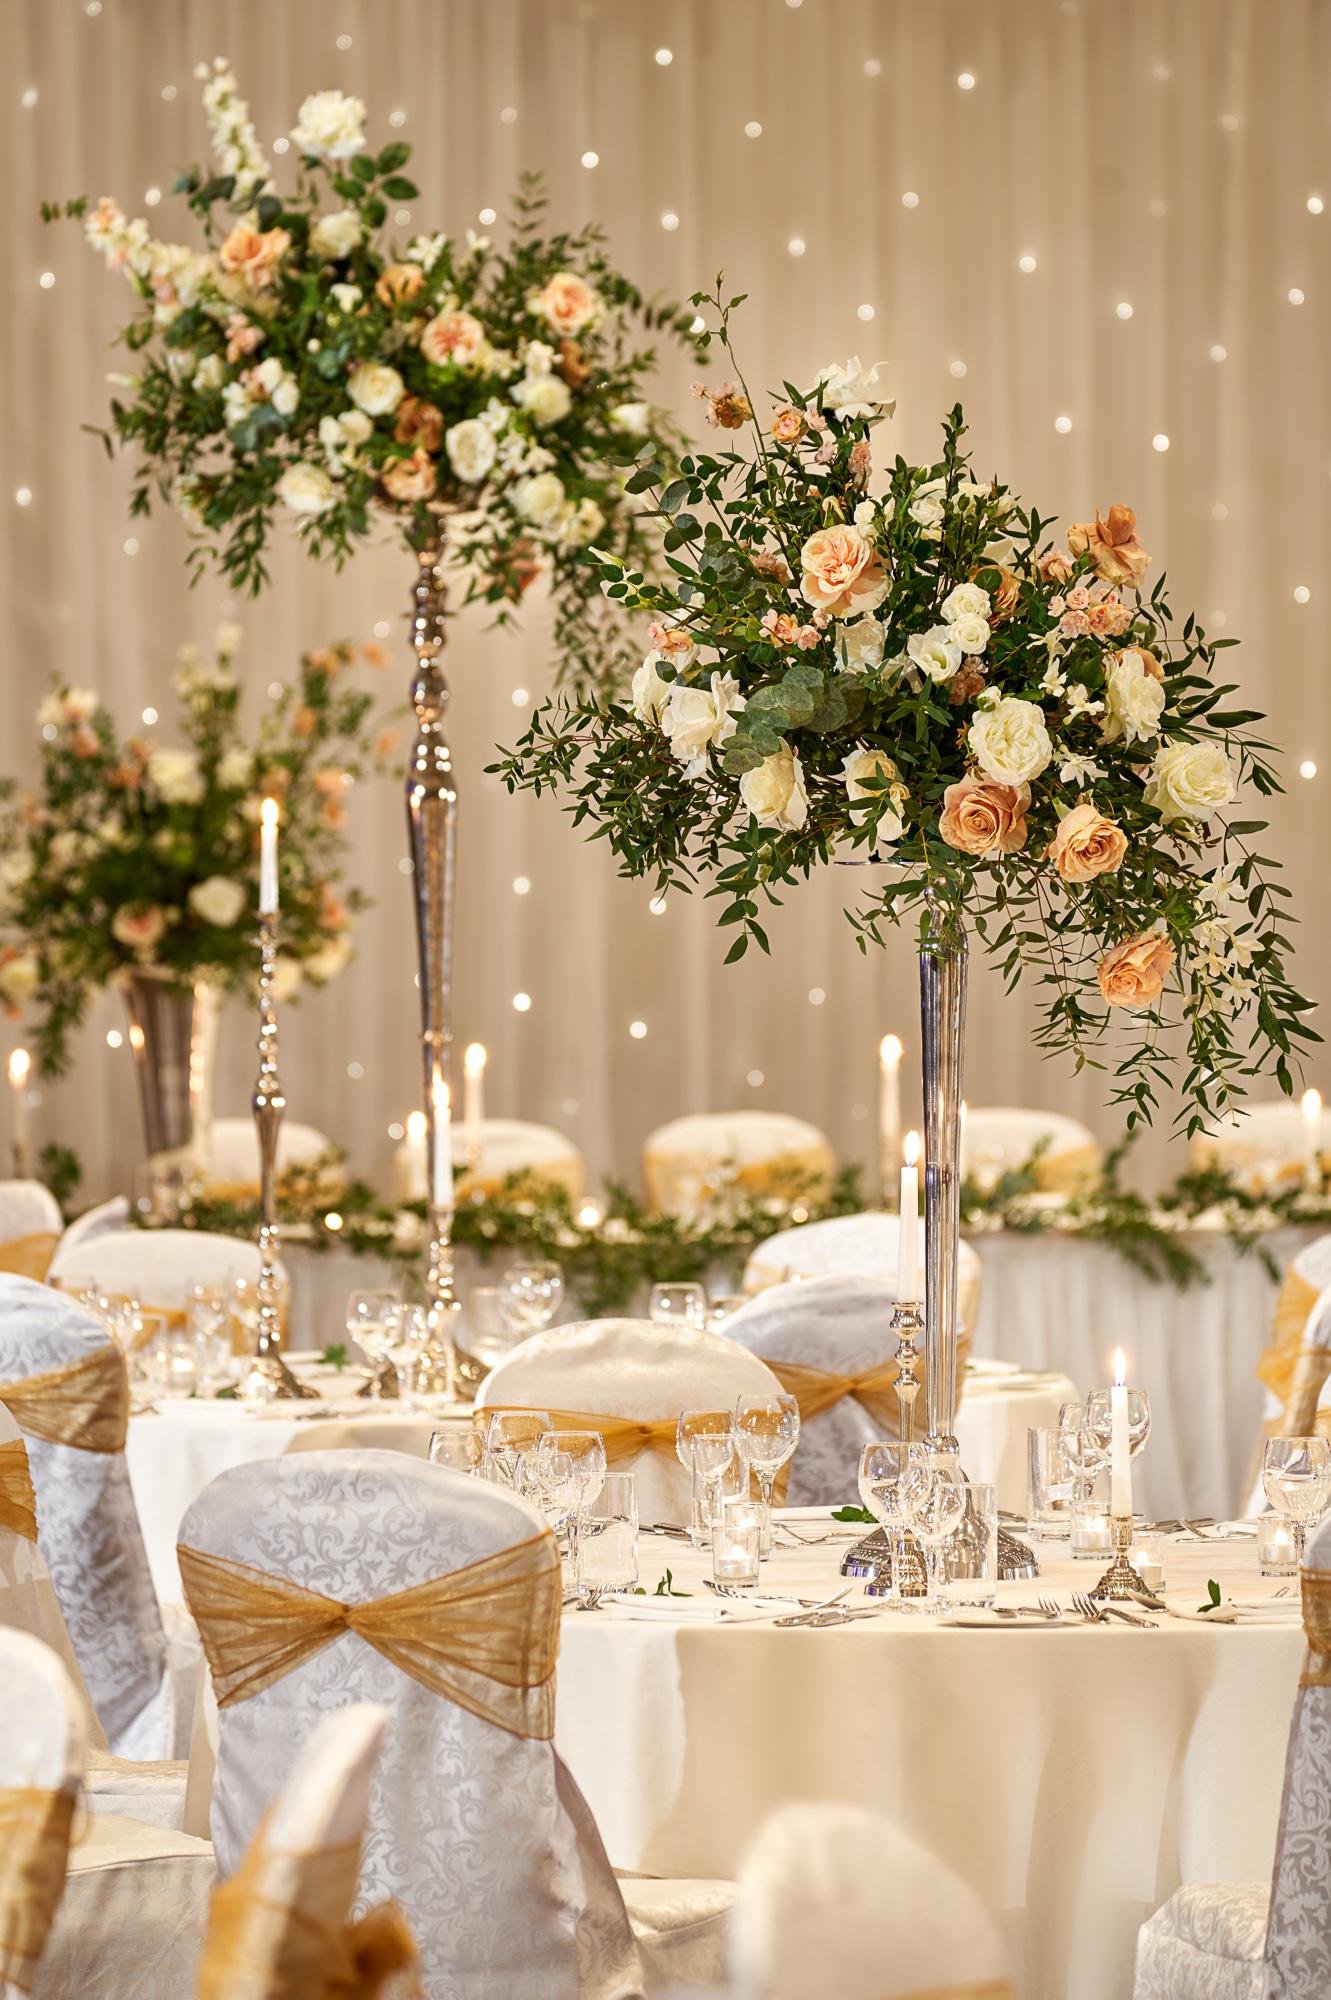 Galmont Wedding 7 2000px.jpg